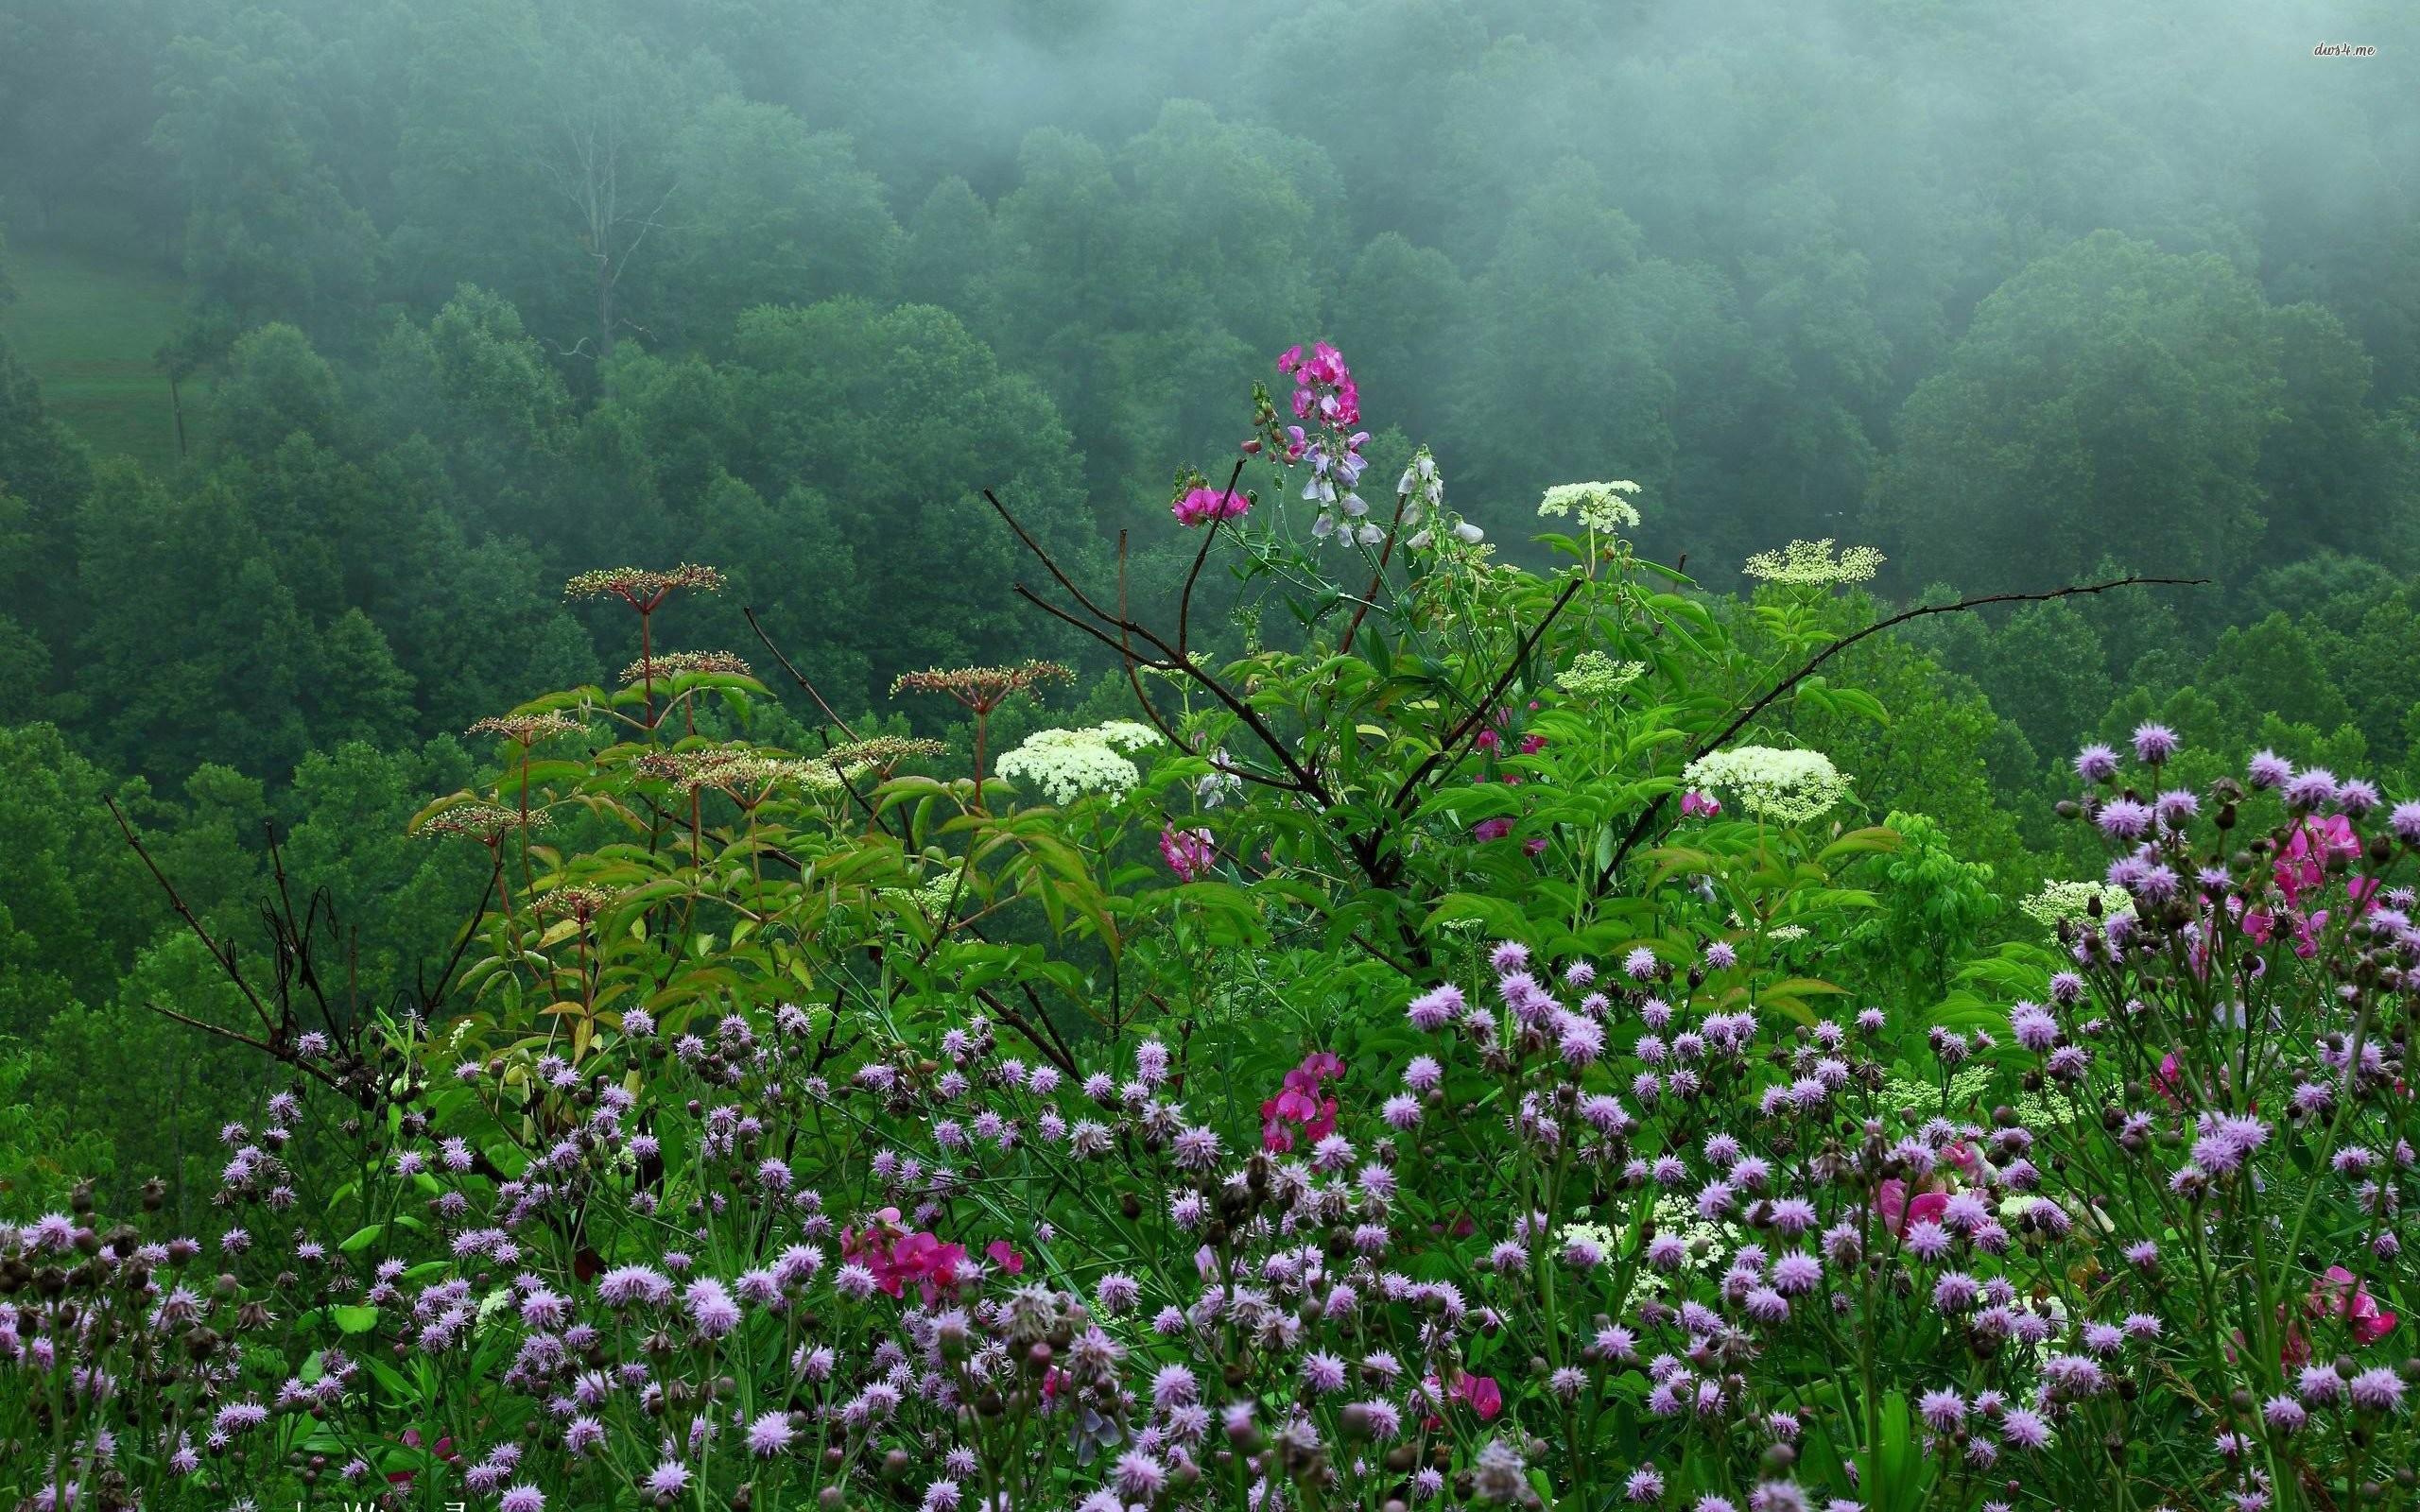 2560x1600 Raining Over The Wildflowers In Spring Nature HD Desktop Wallpaper Rain